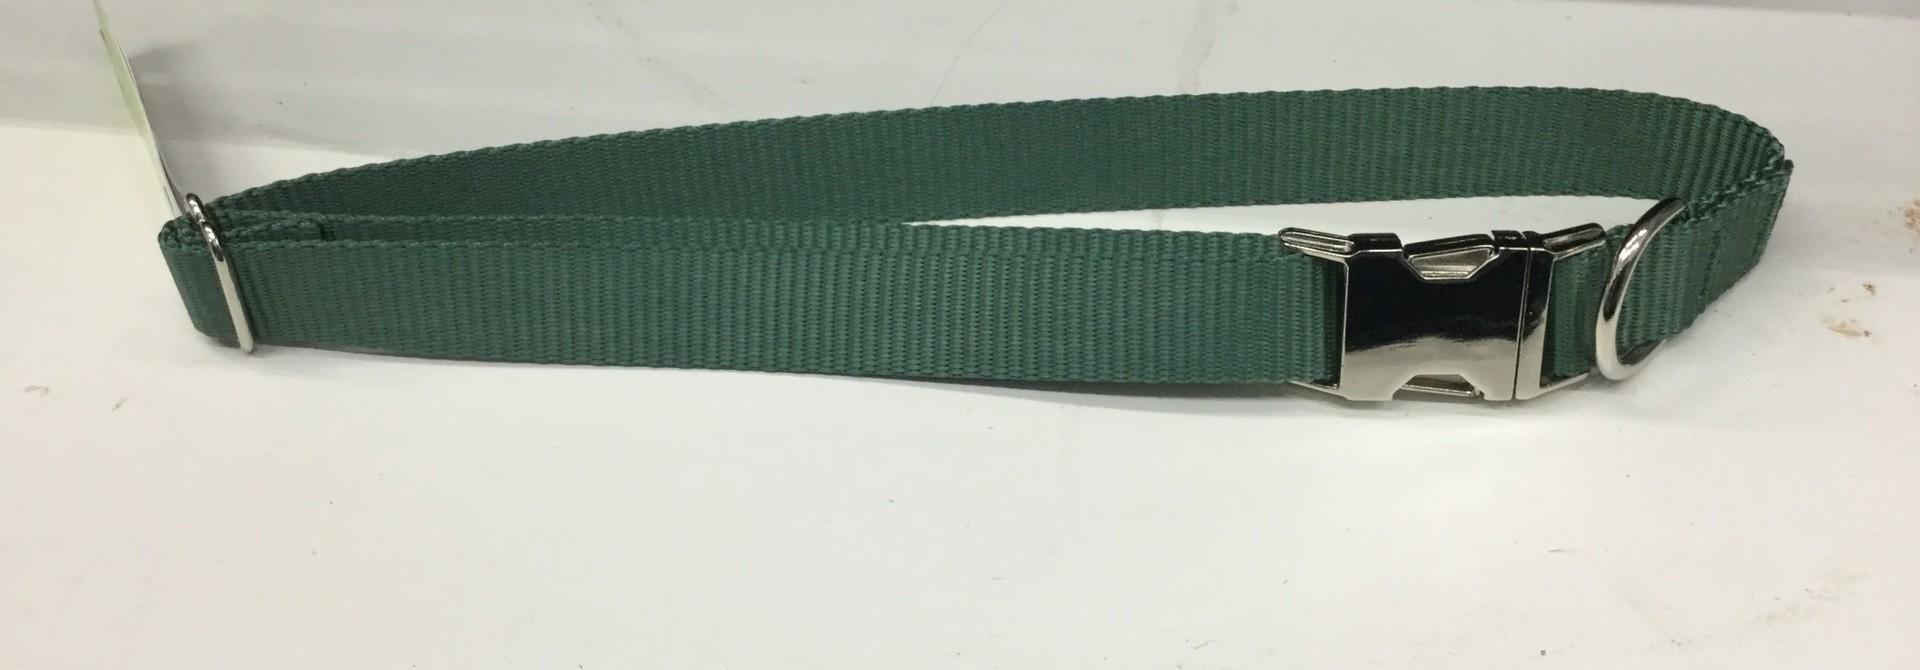 "Adjustable Martingale Collar - Black  Green 23"" - 36"""